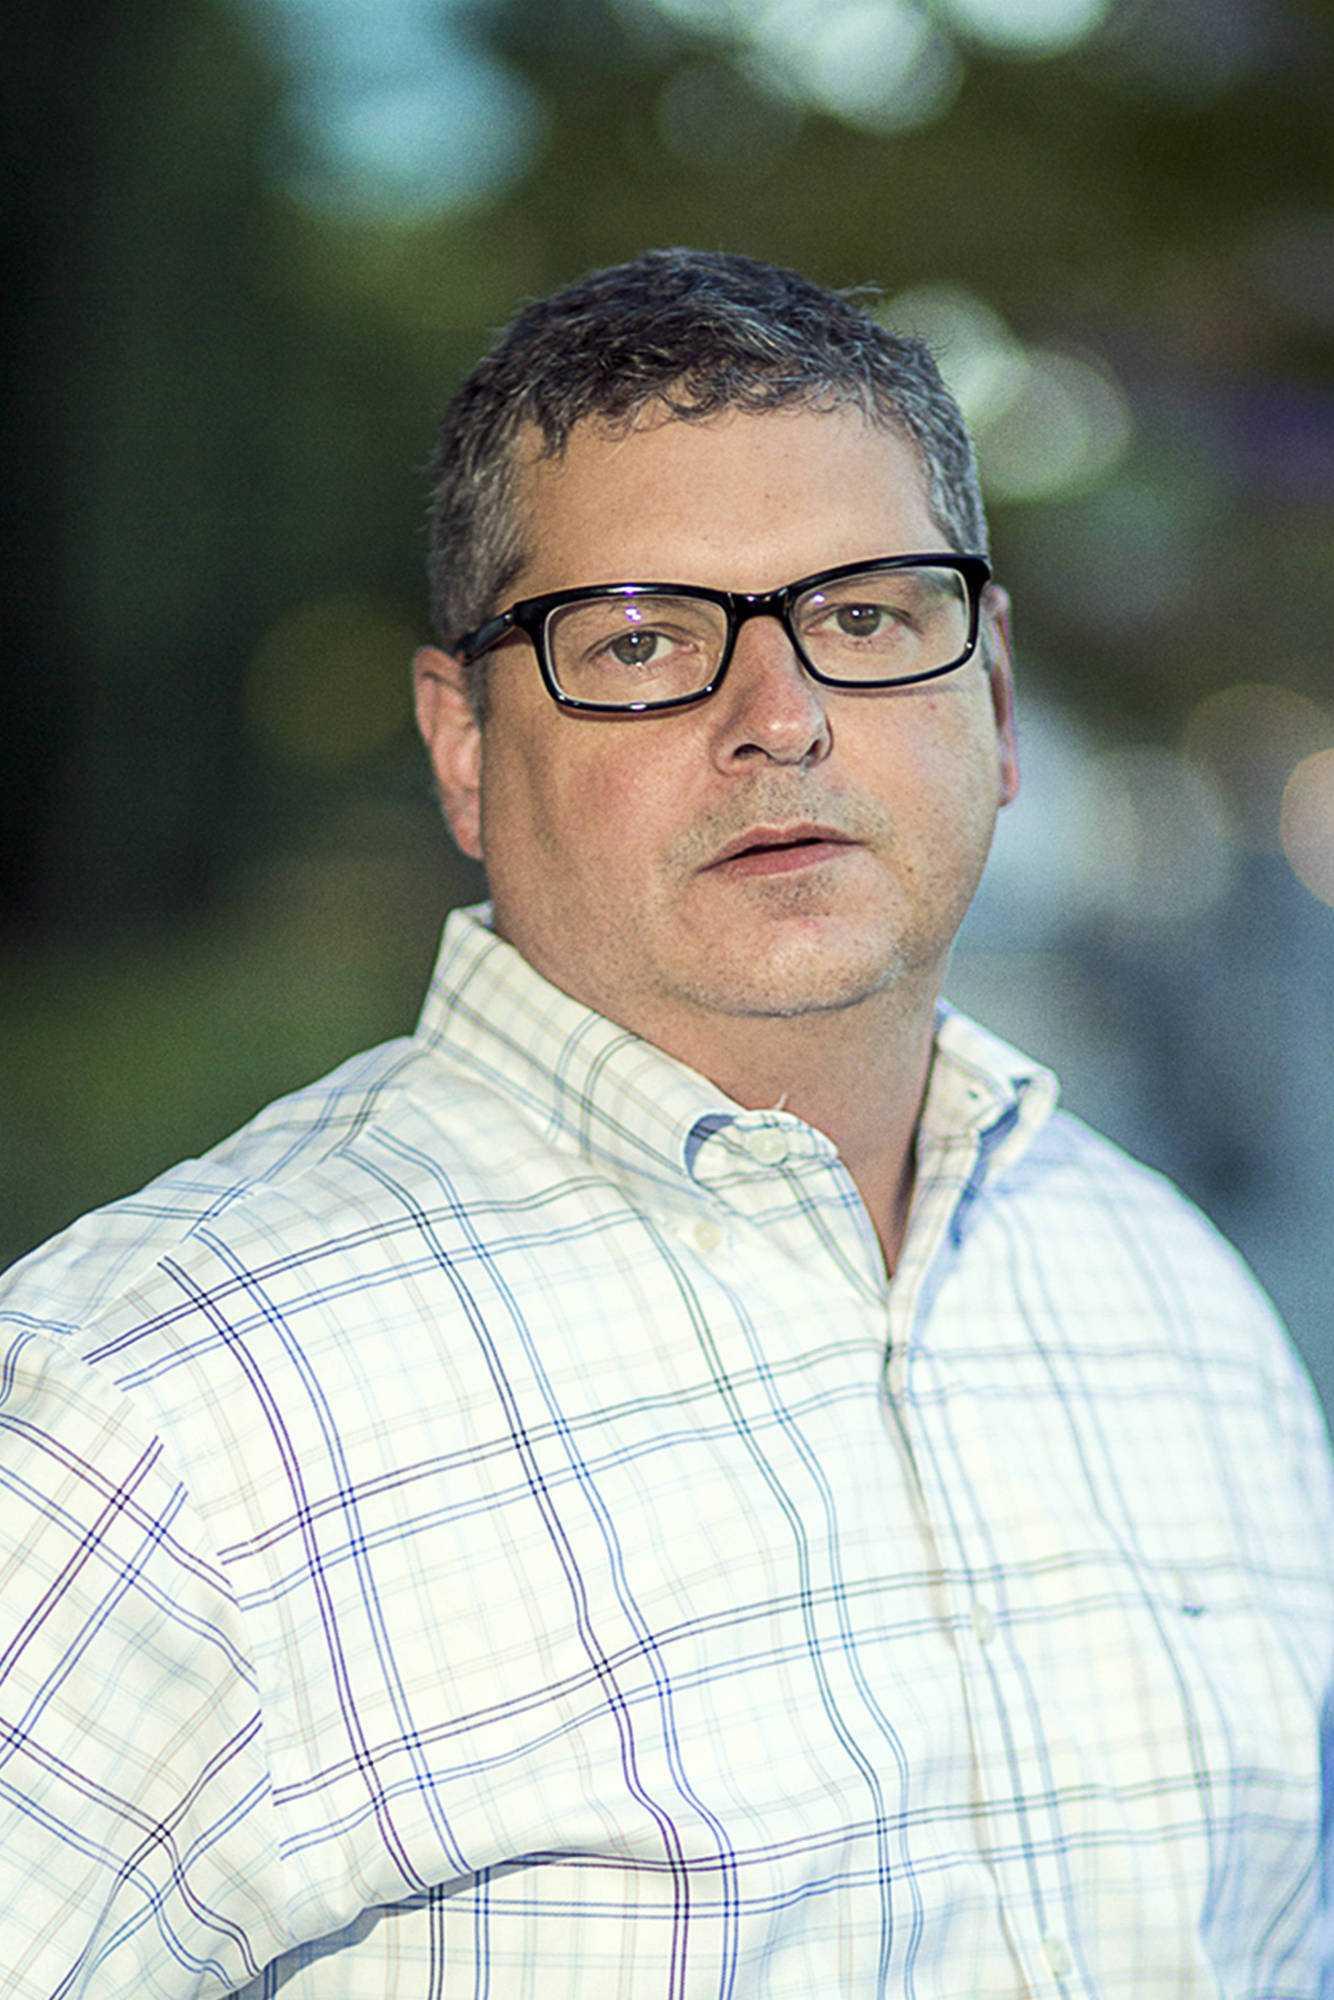 Steve McChesney, Vice President Geschäftsentwicklung bei Druva